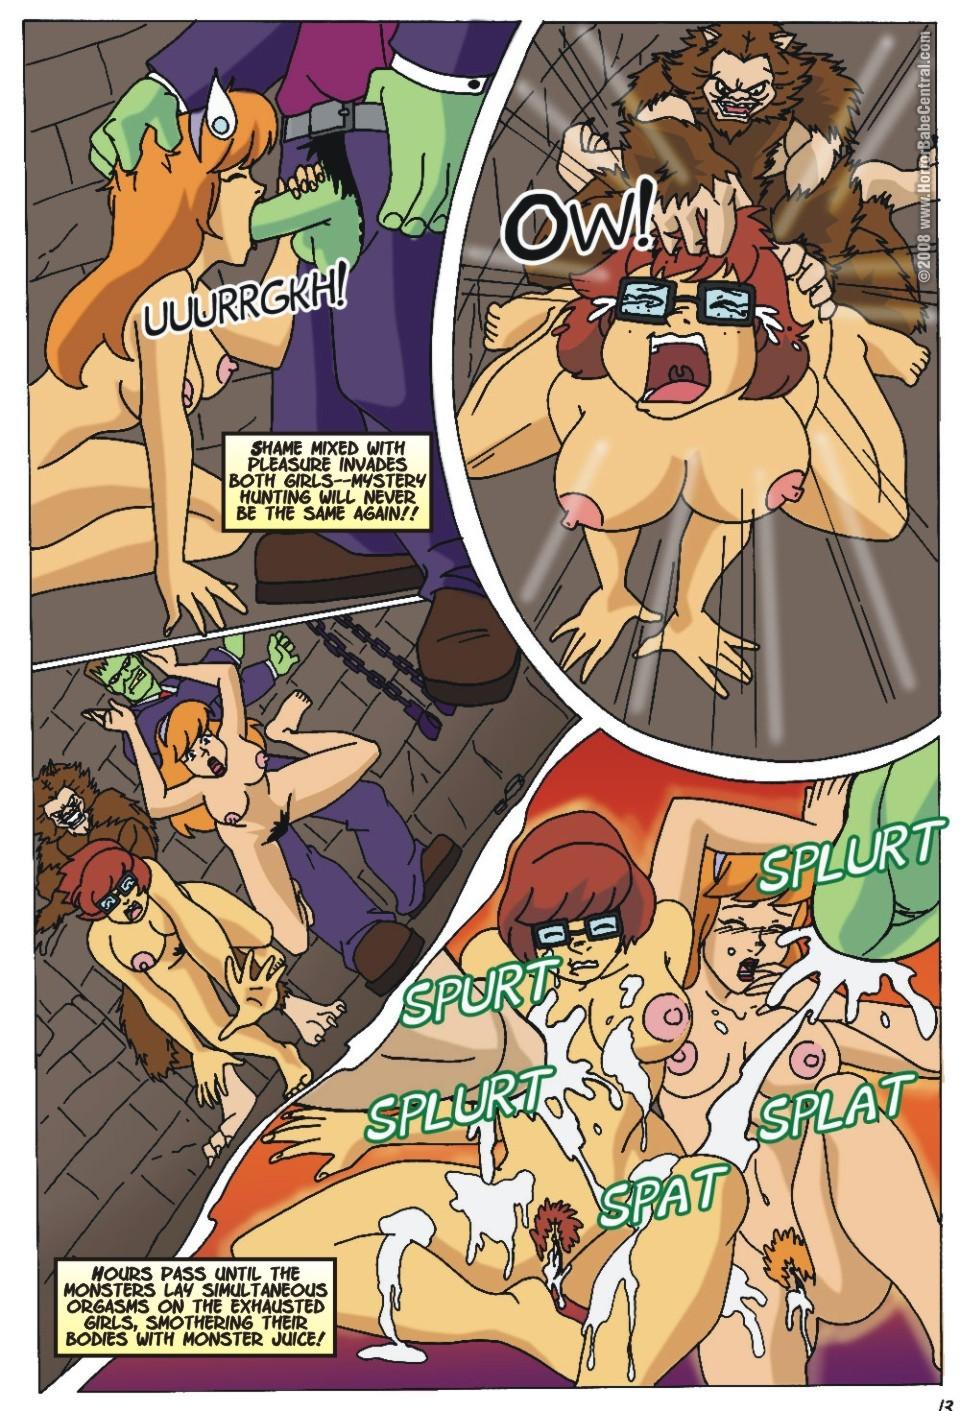 Scooby doo have an idea to fuck porn comics